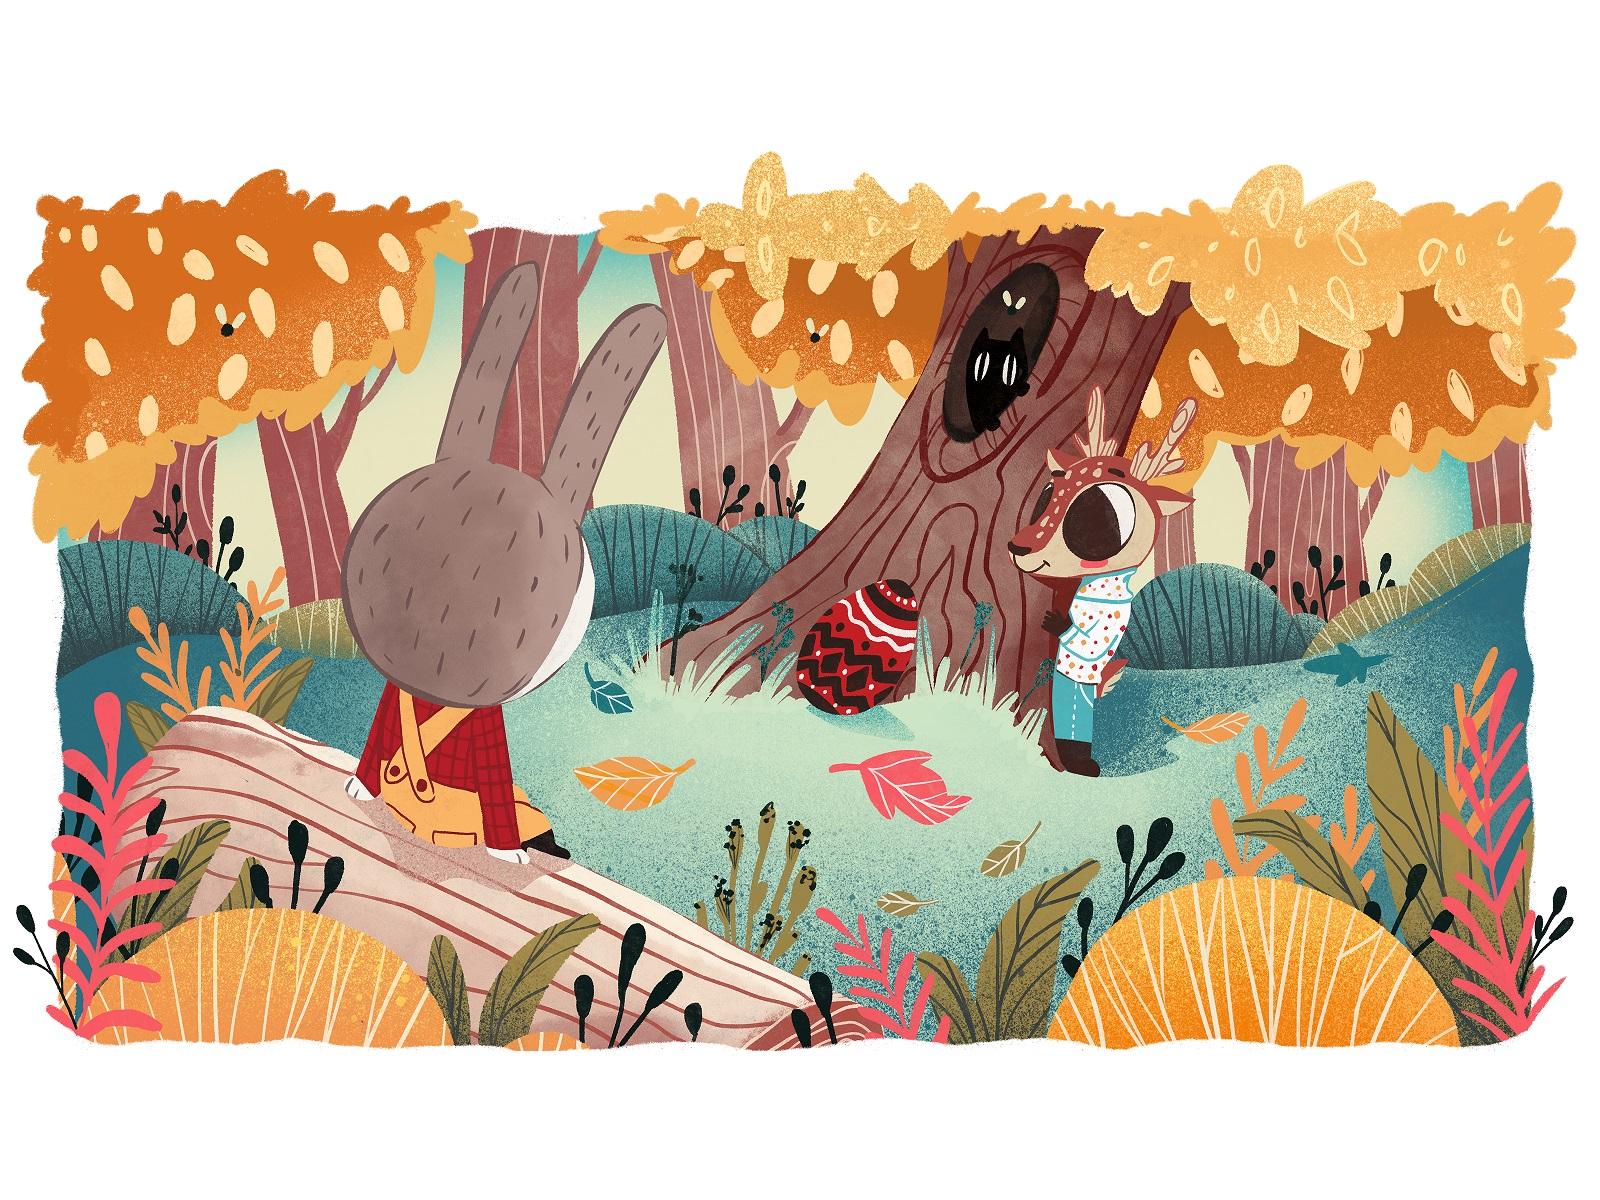 easter bunny adventures book illustration tubik